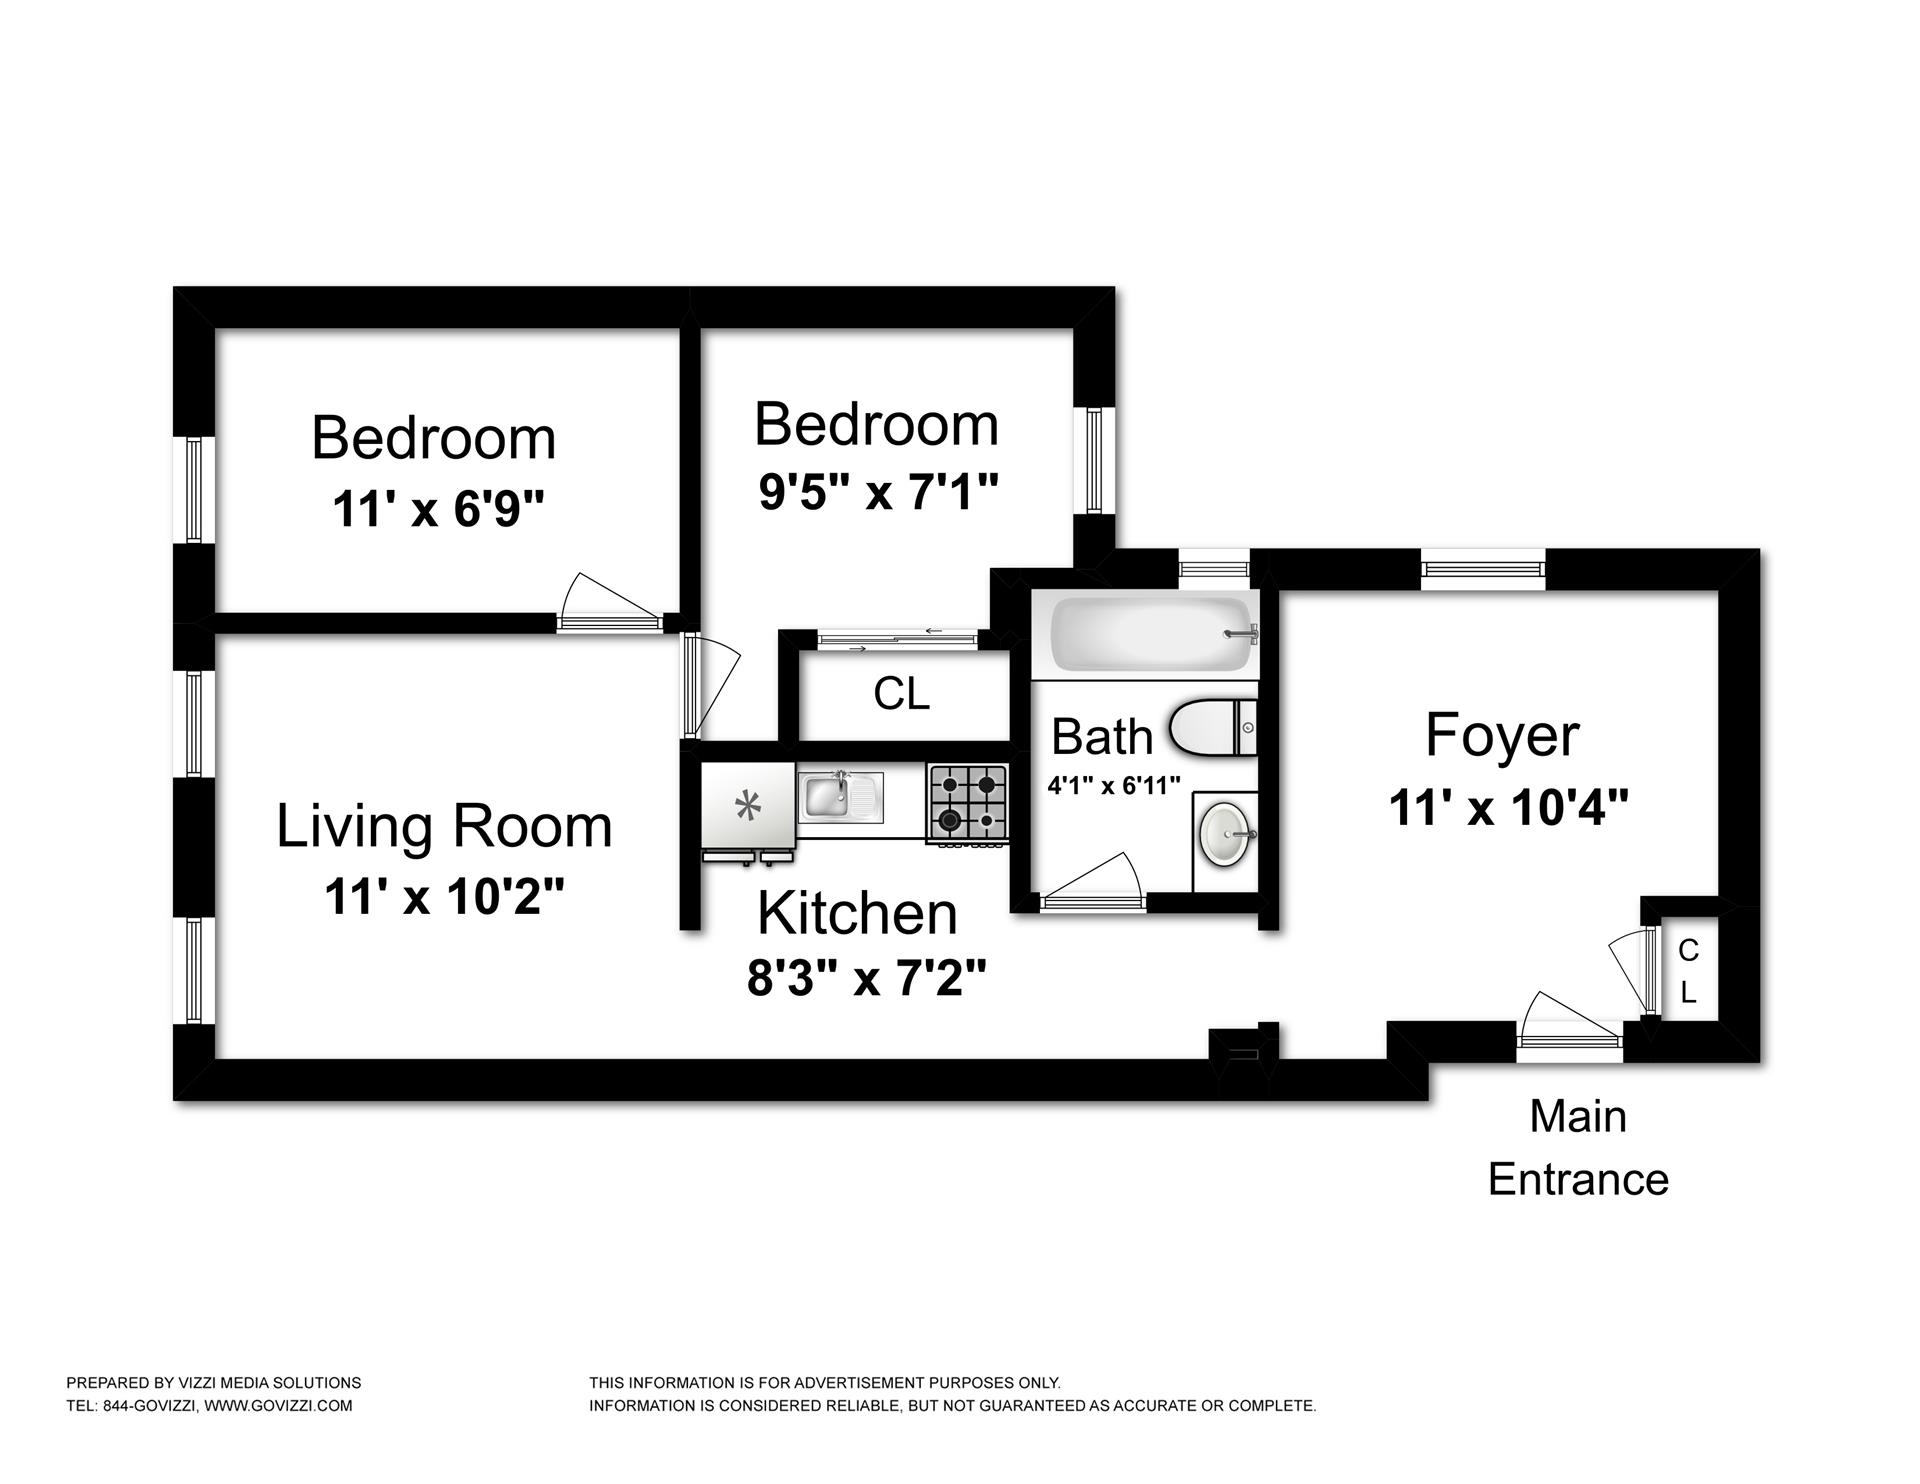 Floor plan of 108 Seigel St, 7 - Williamsburg, New York